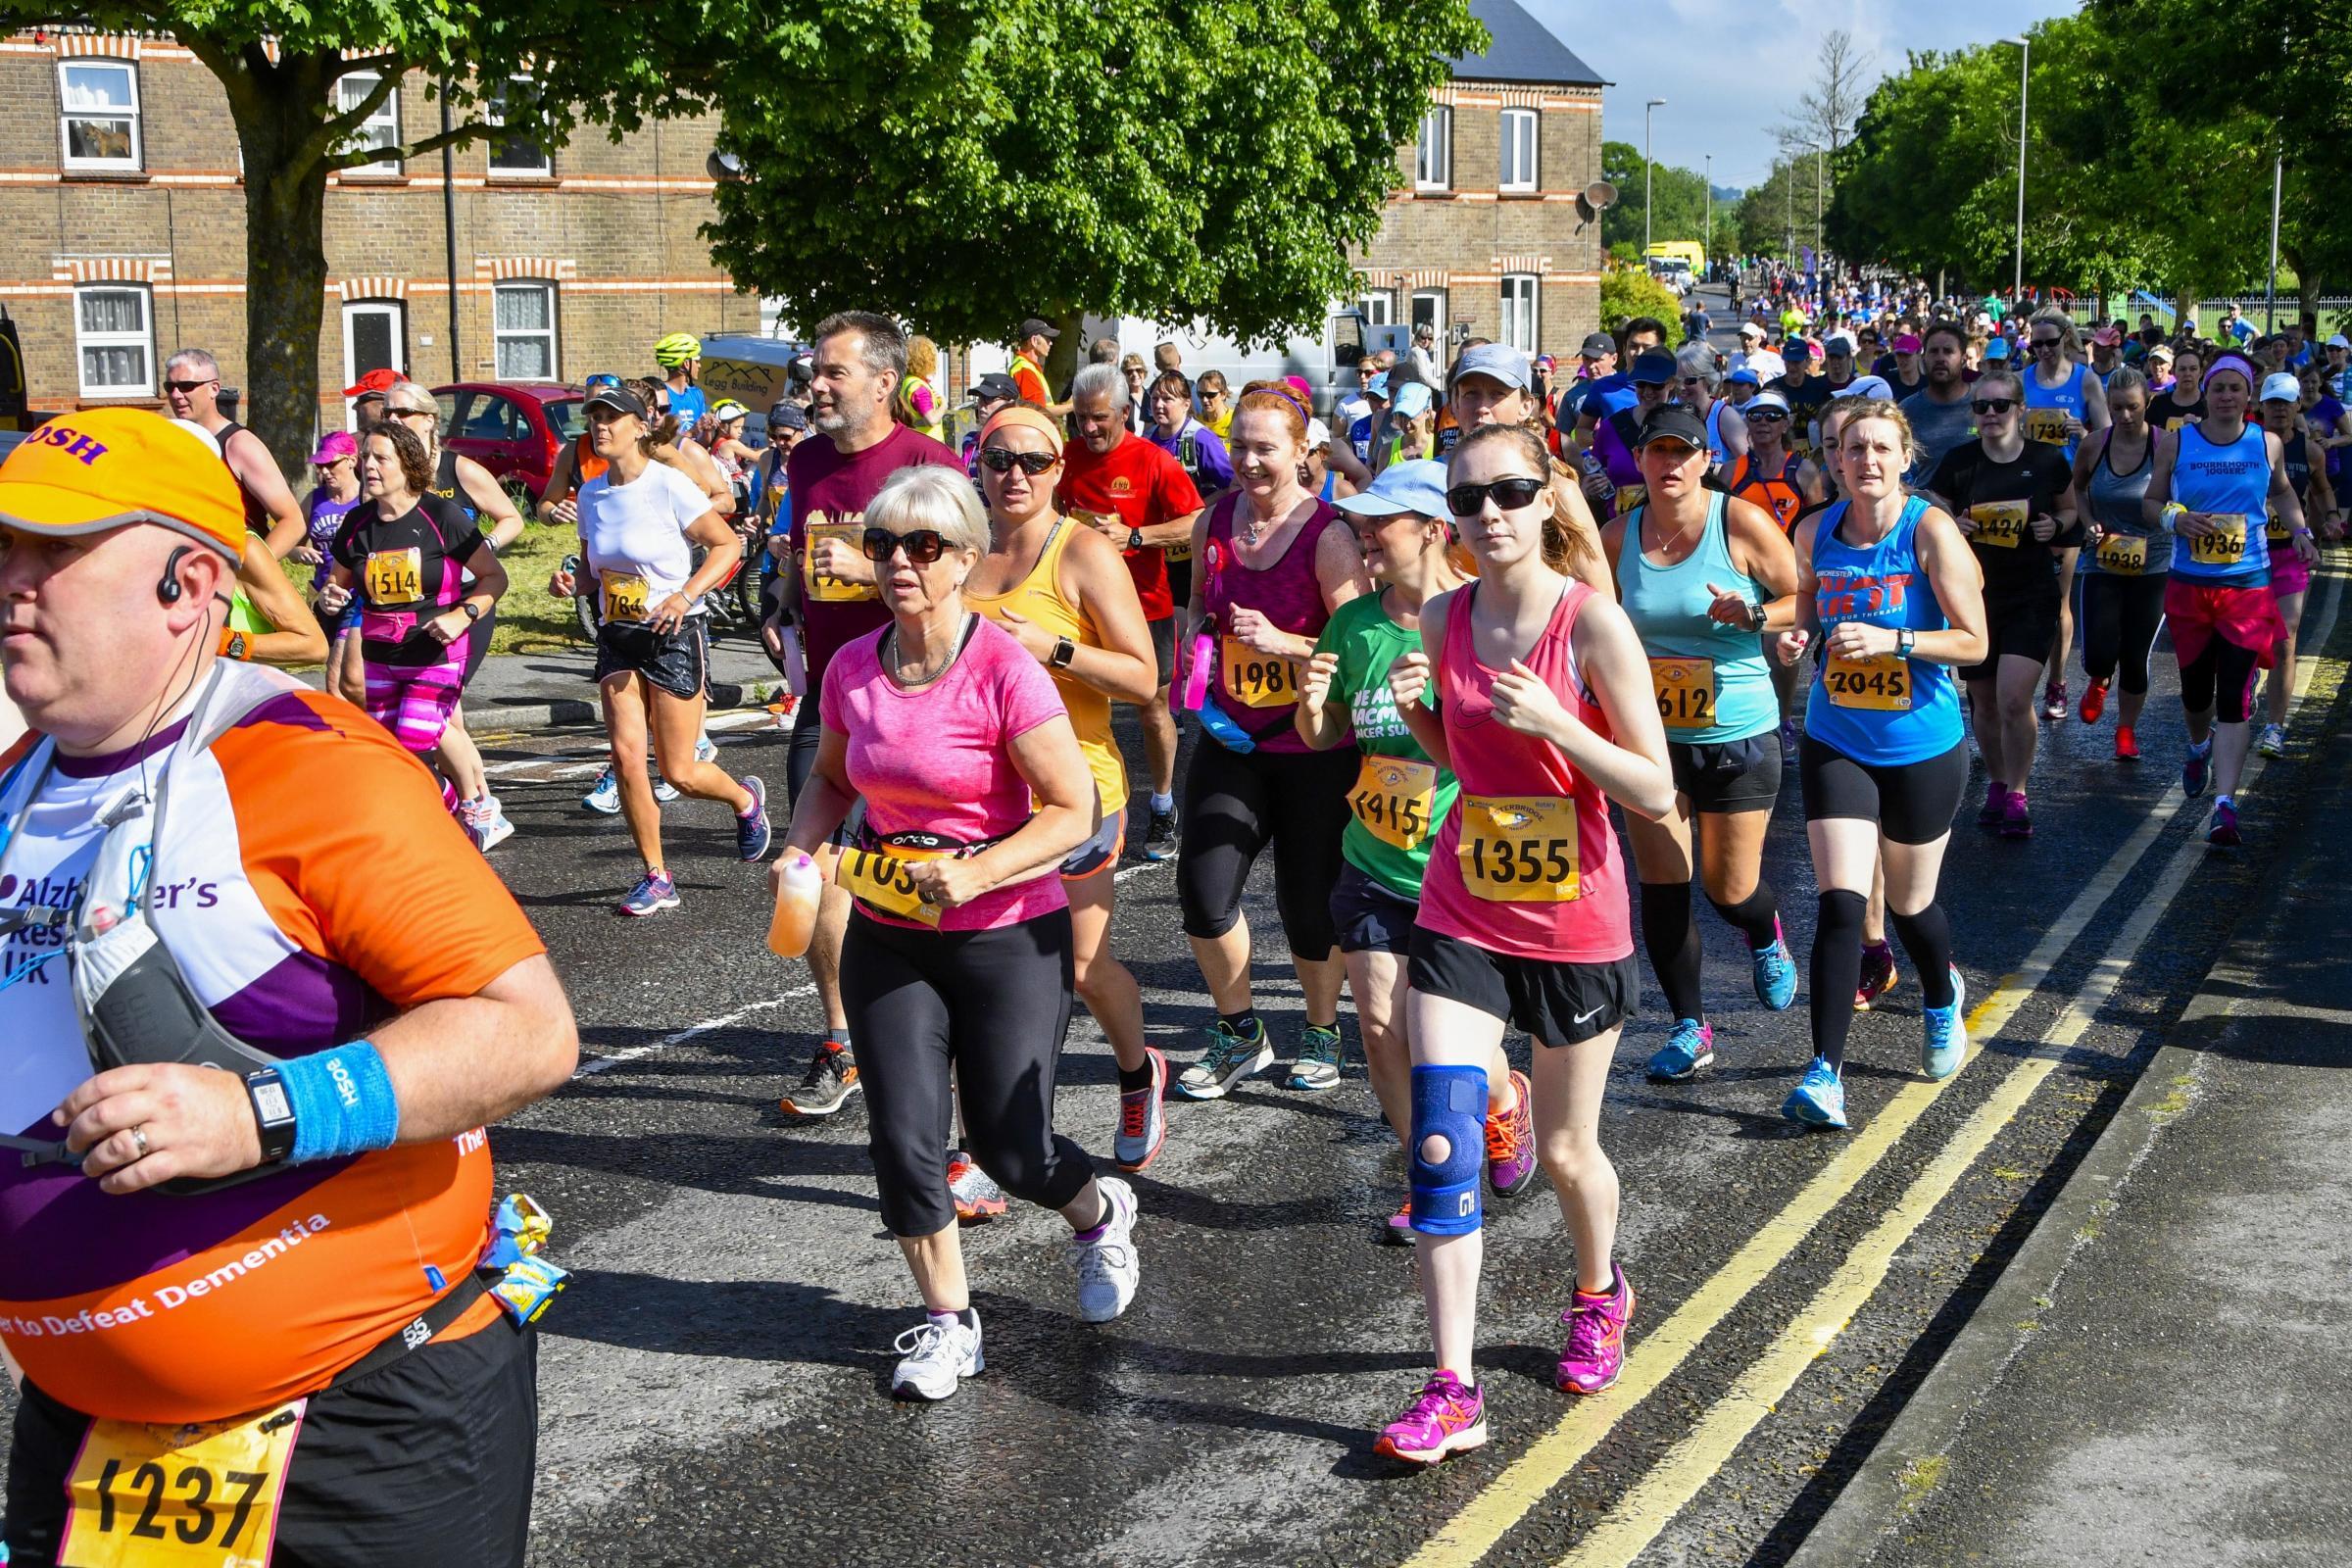 Entrants told that Dorchester half marathon is cancelled